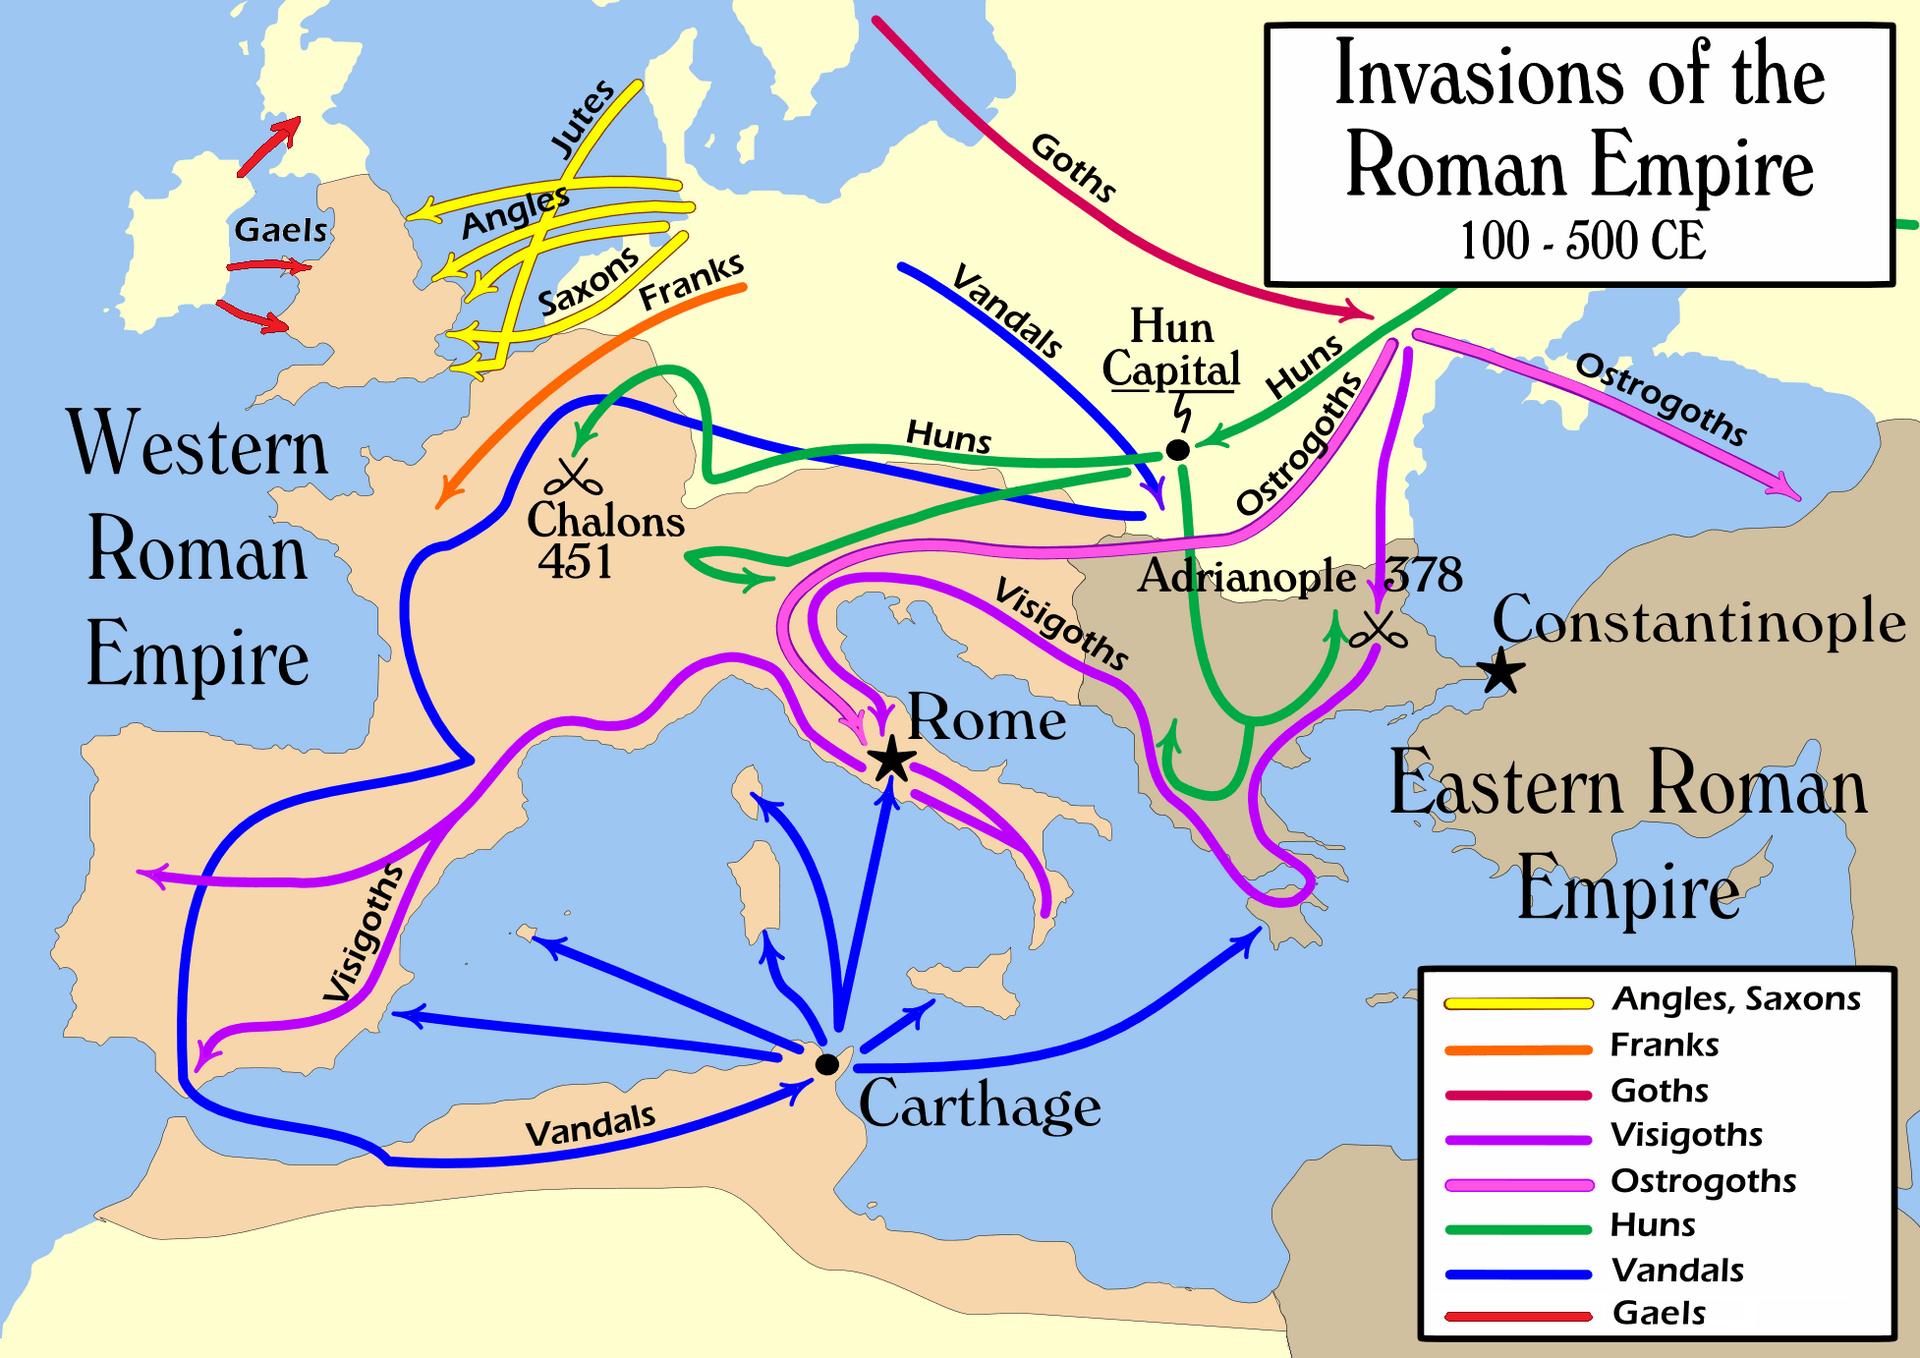 1920px-Invasions_of_the_Roman_Empire_1.p